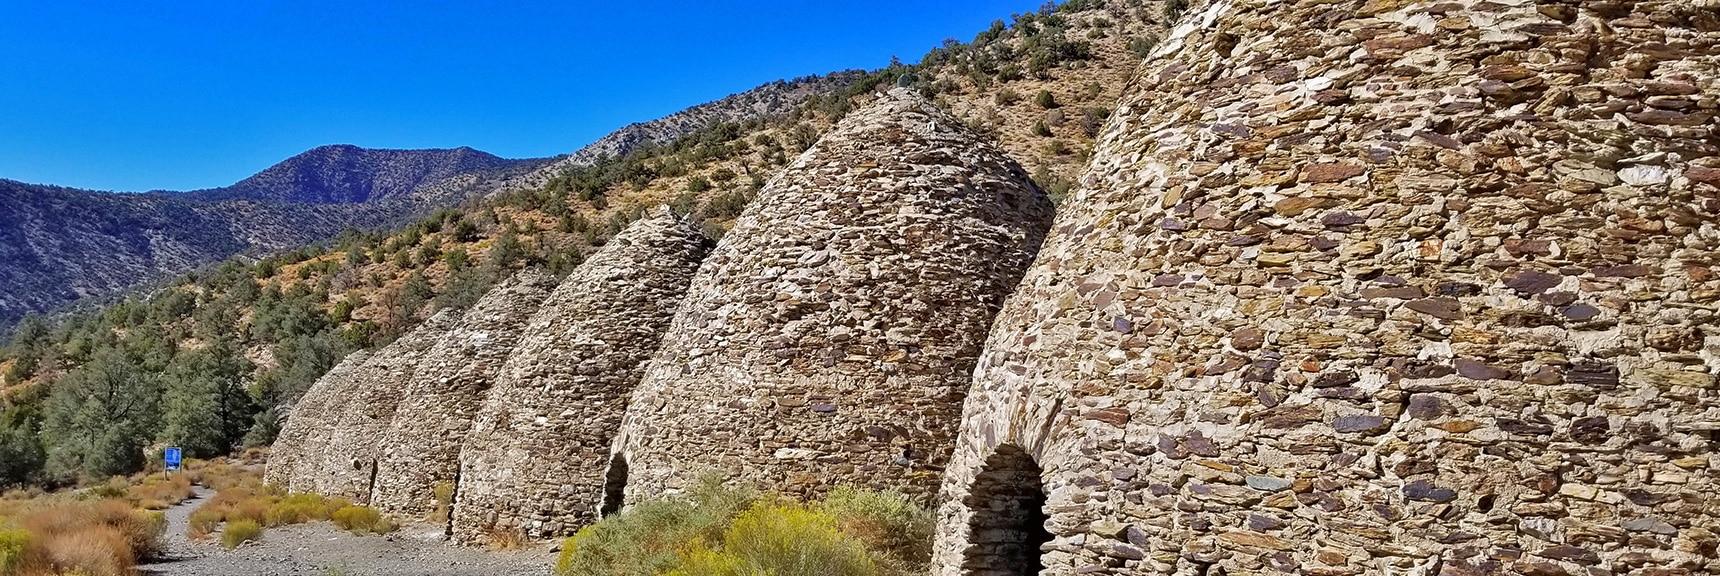 Charcoal Kilns with Wildrose Peak Trailhead to the Left and Wildrose Peak Area Above | Charcoal Kilns | Death Valley, California